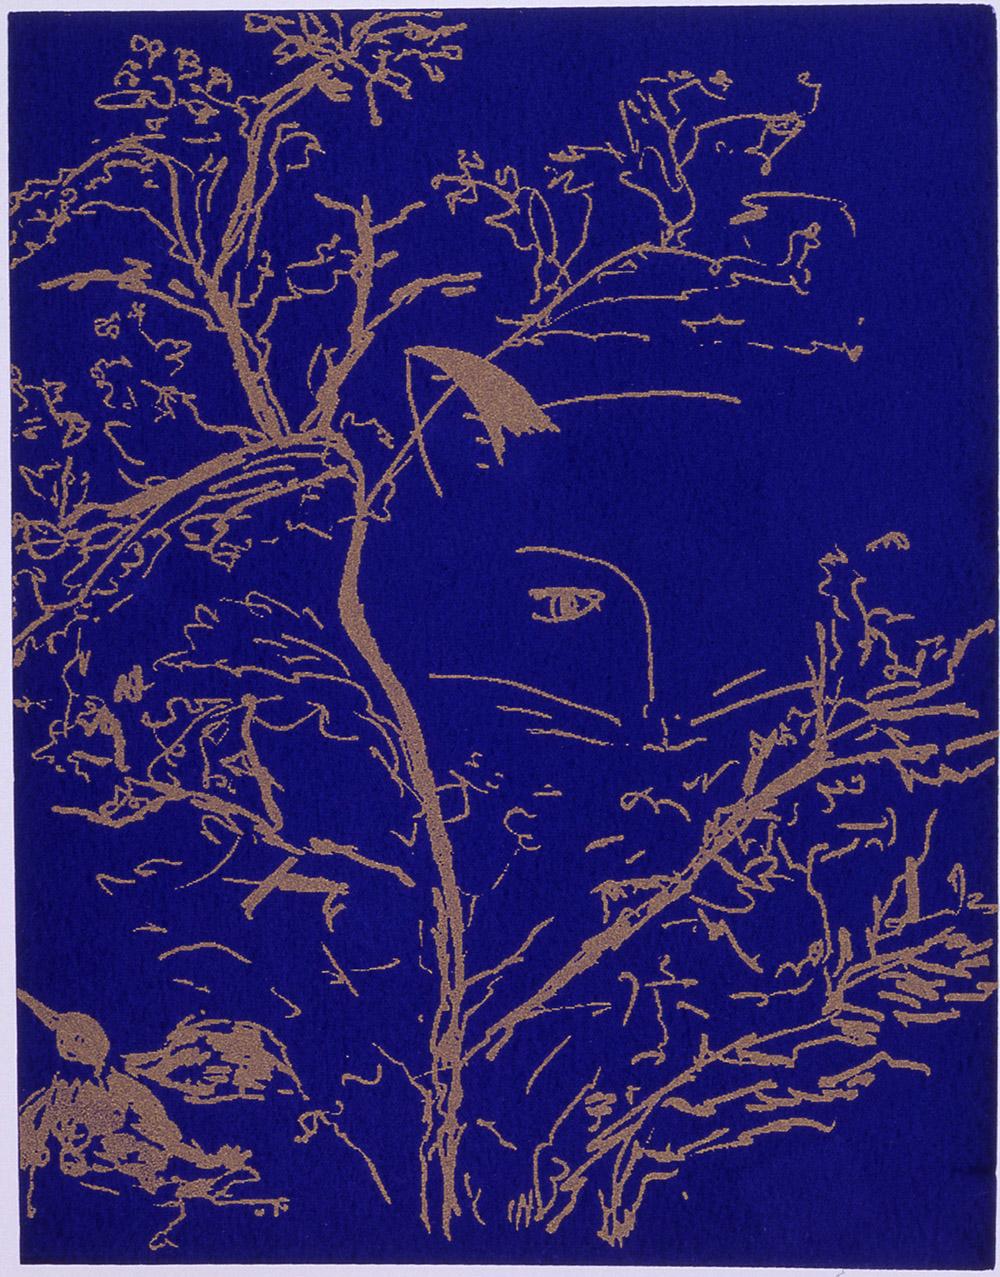 21.-Ono-Hunt-1995.-Screen-print-on-paper-20.3-x-15.2-cm-x.jpg